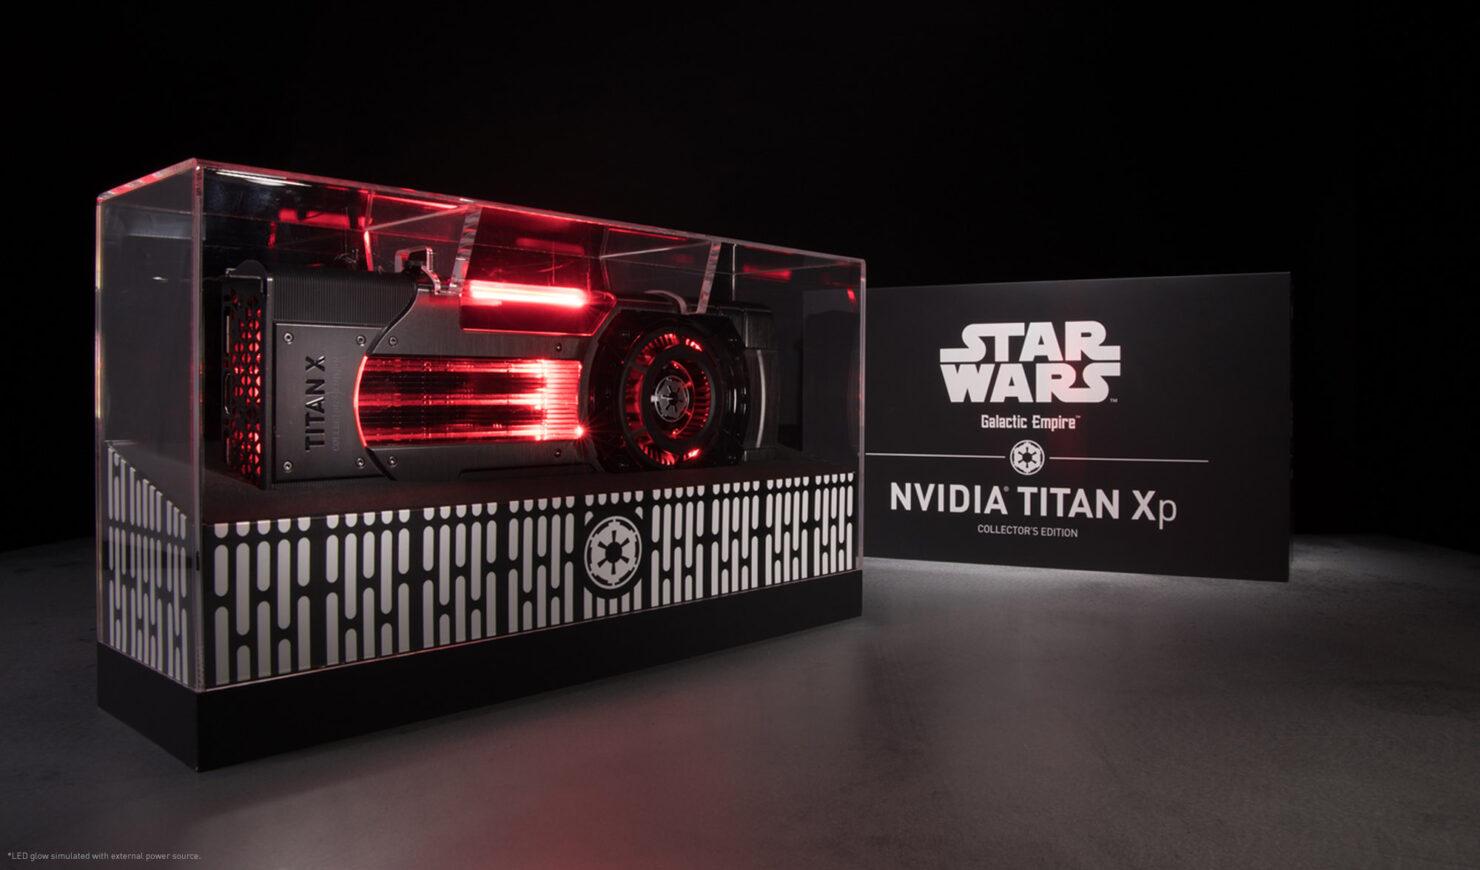 nvidia-titan-xp-ce-star-wars-galactic-empire-gallery-06